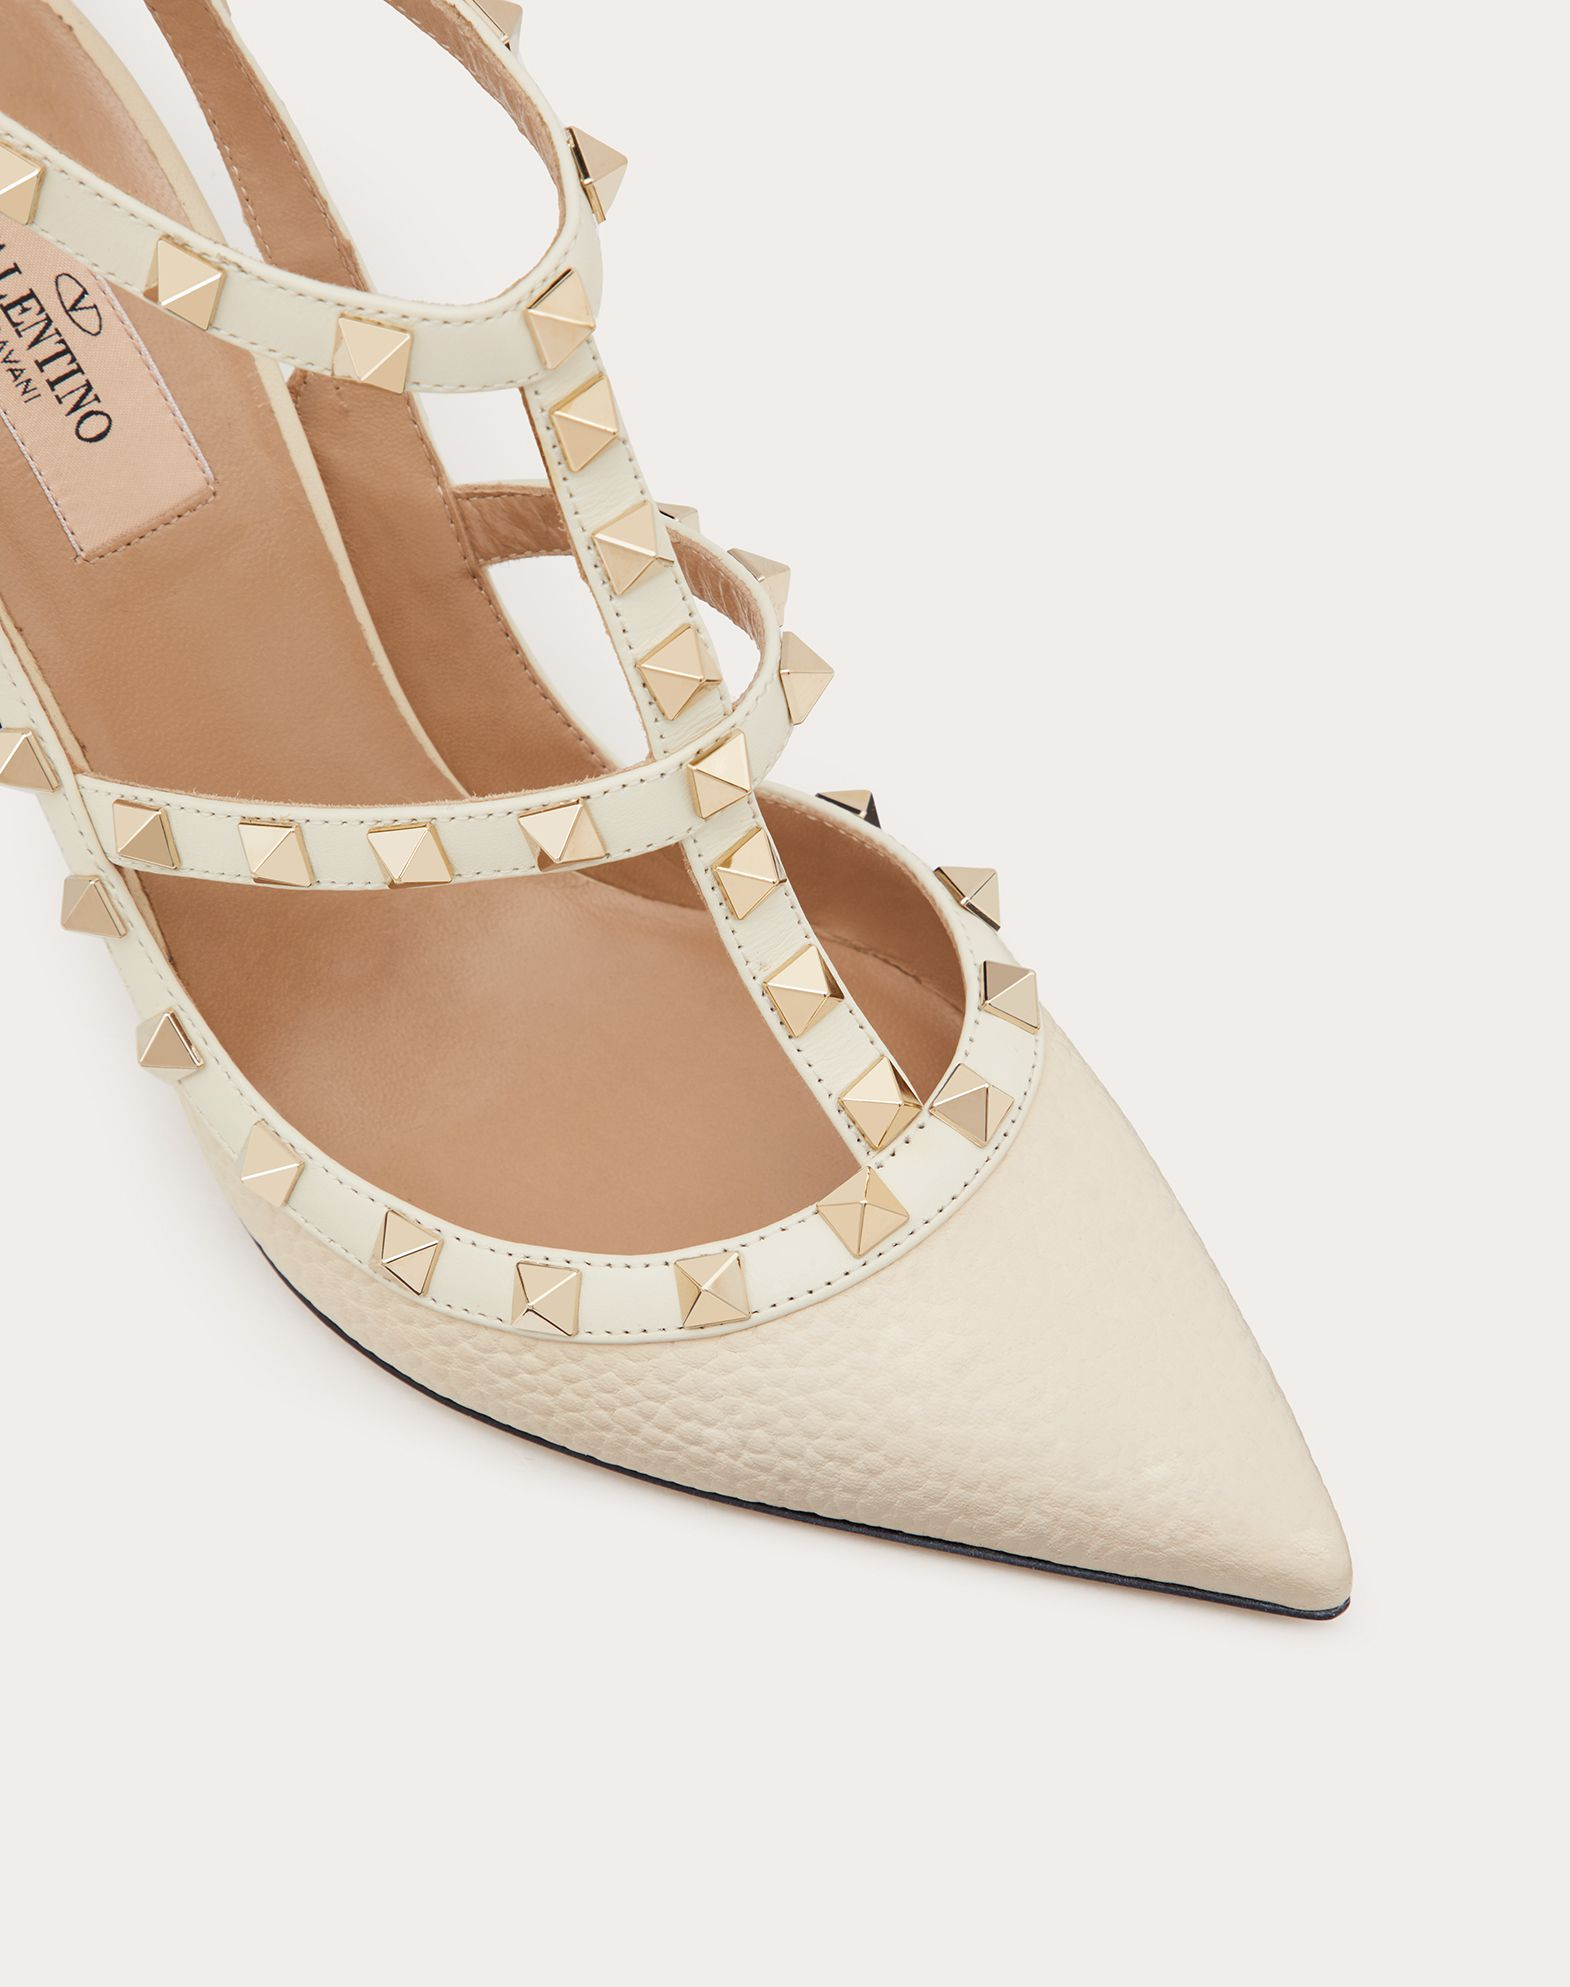 VALENTINO GARAVANI Rockstud Ankle Strap HIGH HEEL PUMPS D a